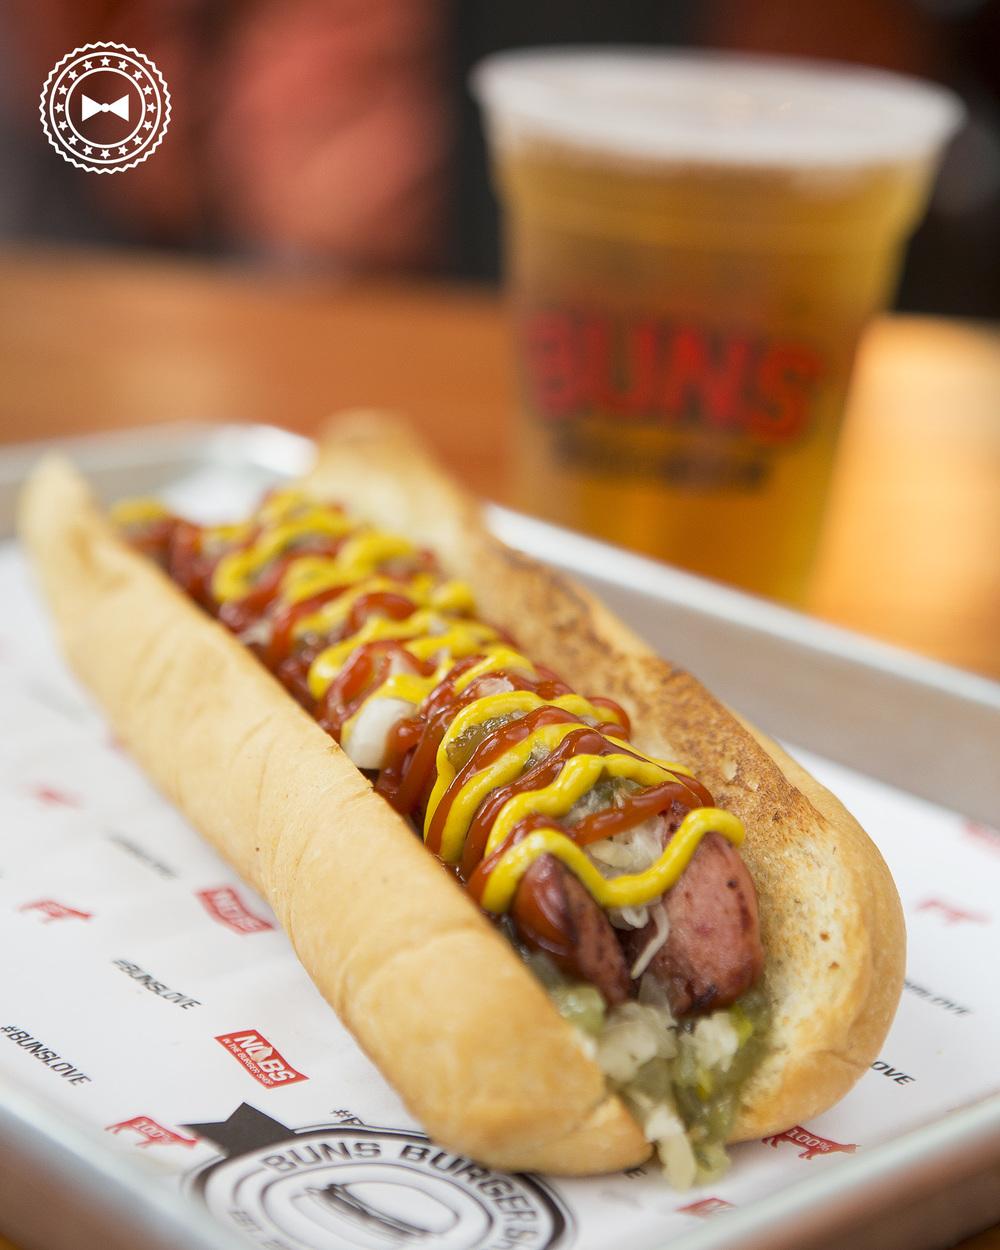 BUNS_HotdogAndBeer.jpg